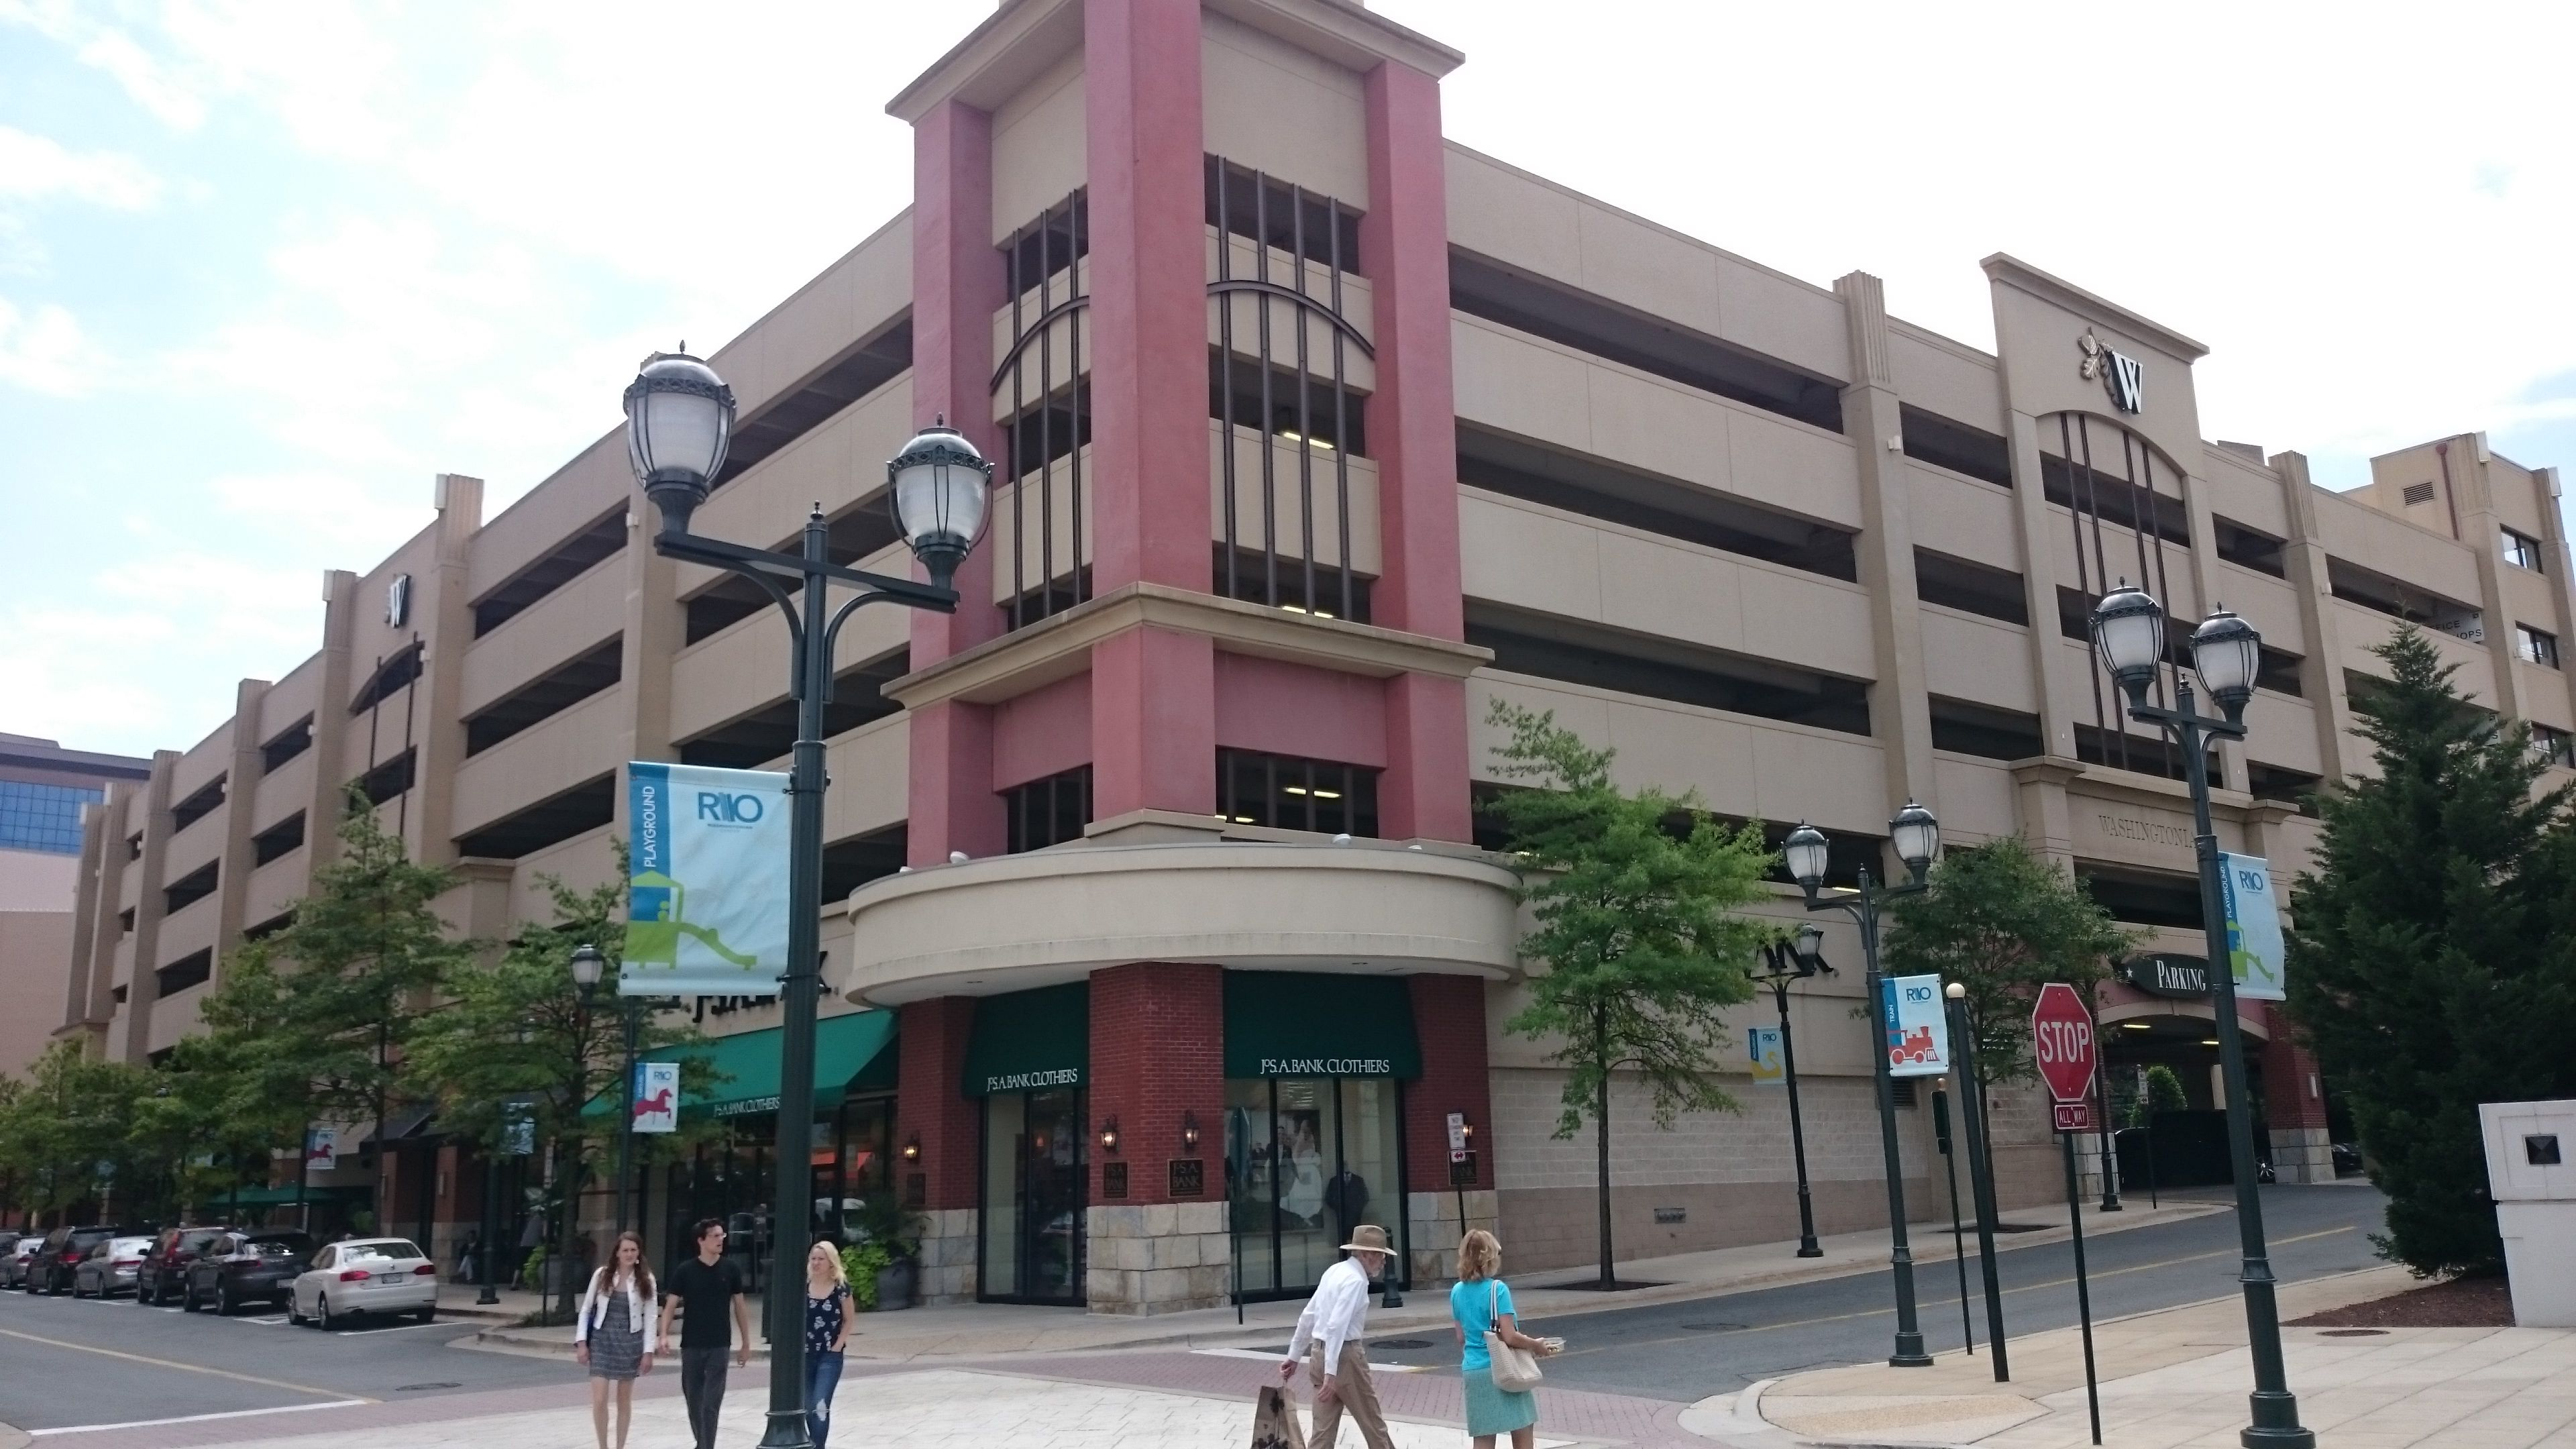 Rio Gaithersburg Md >> Guide To Rio Washingtonian Center In Gaithersburg